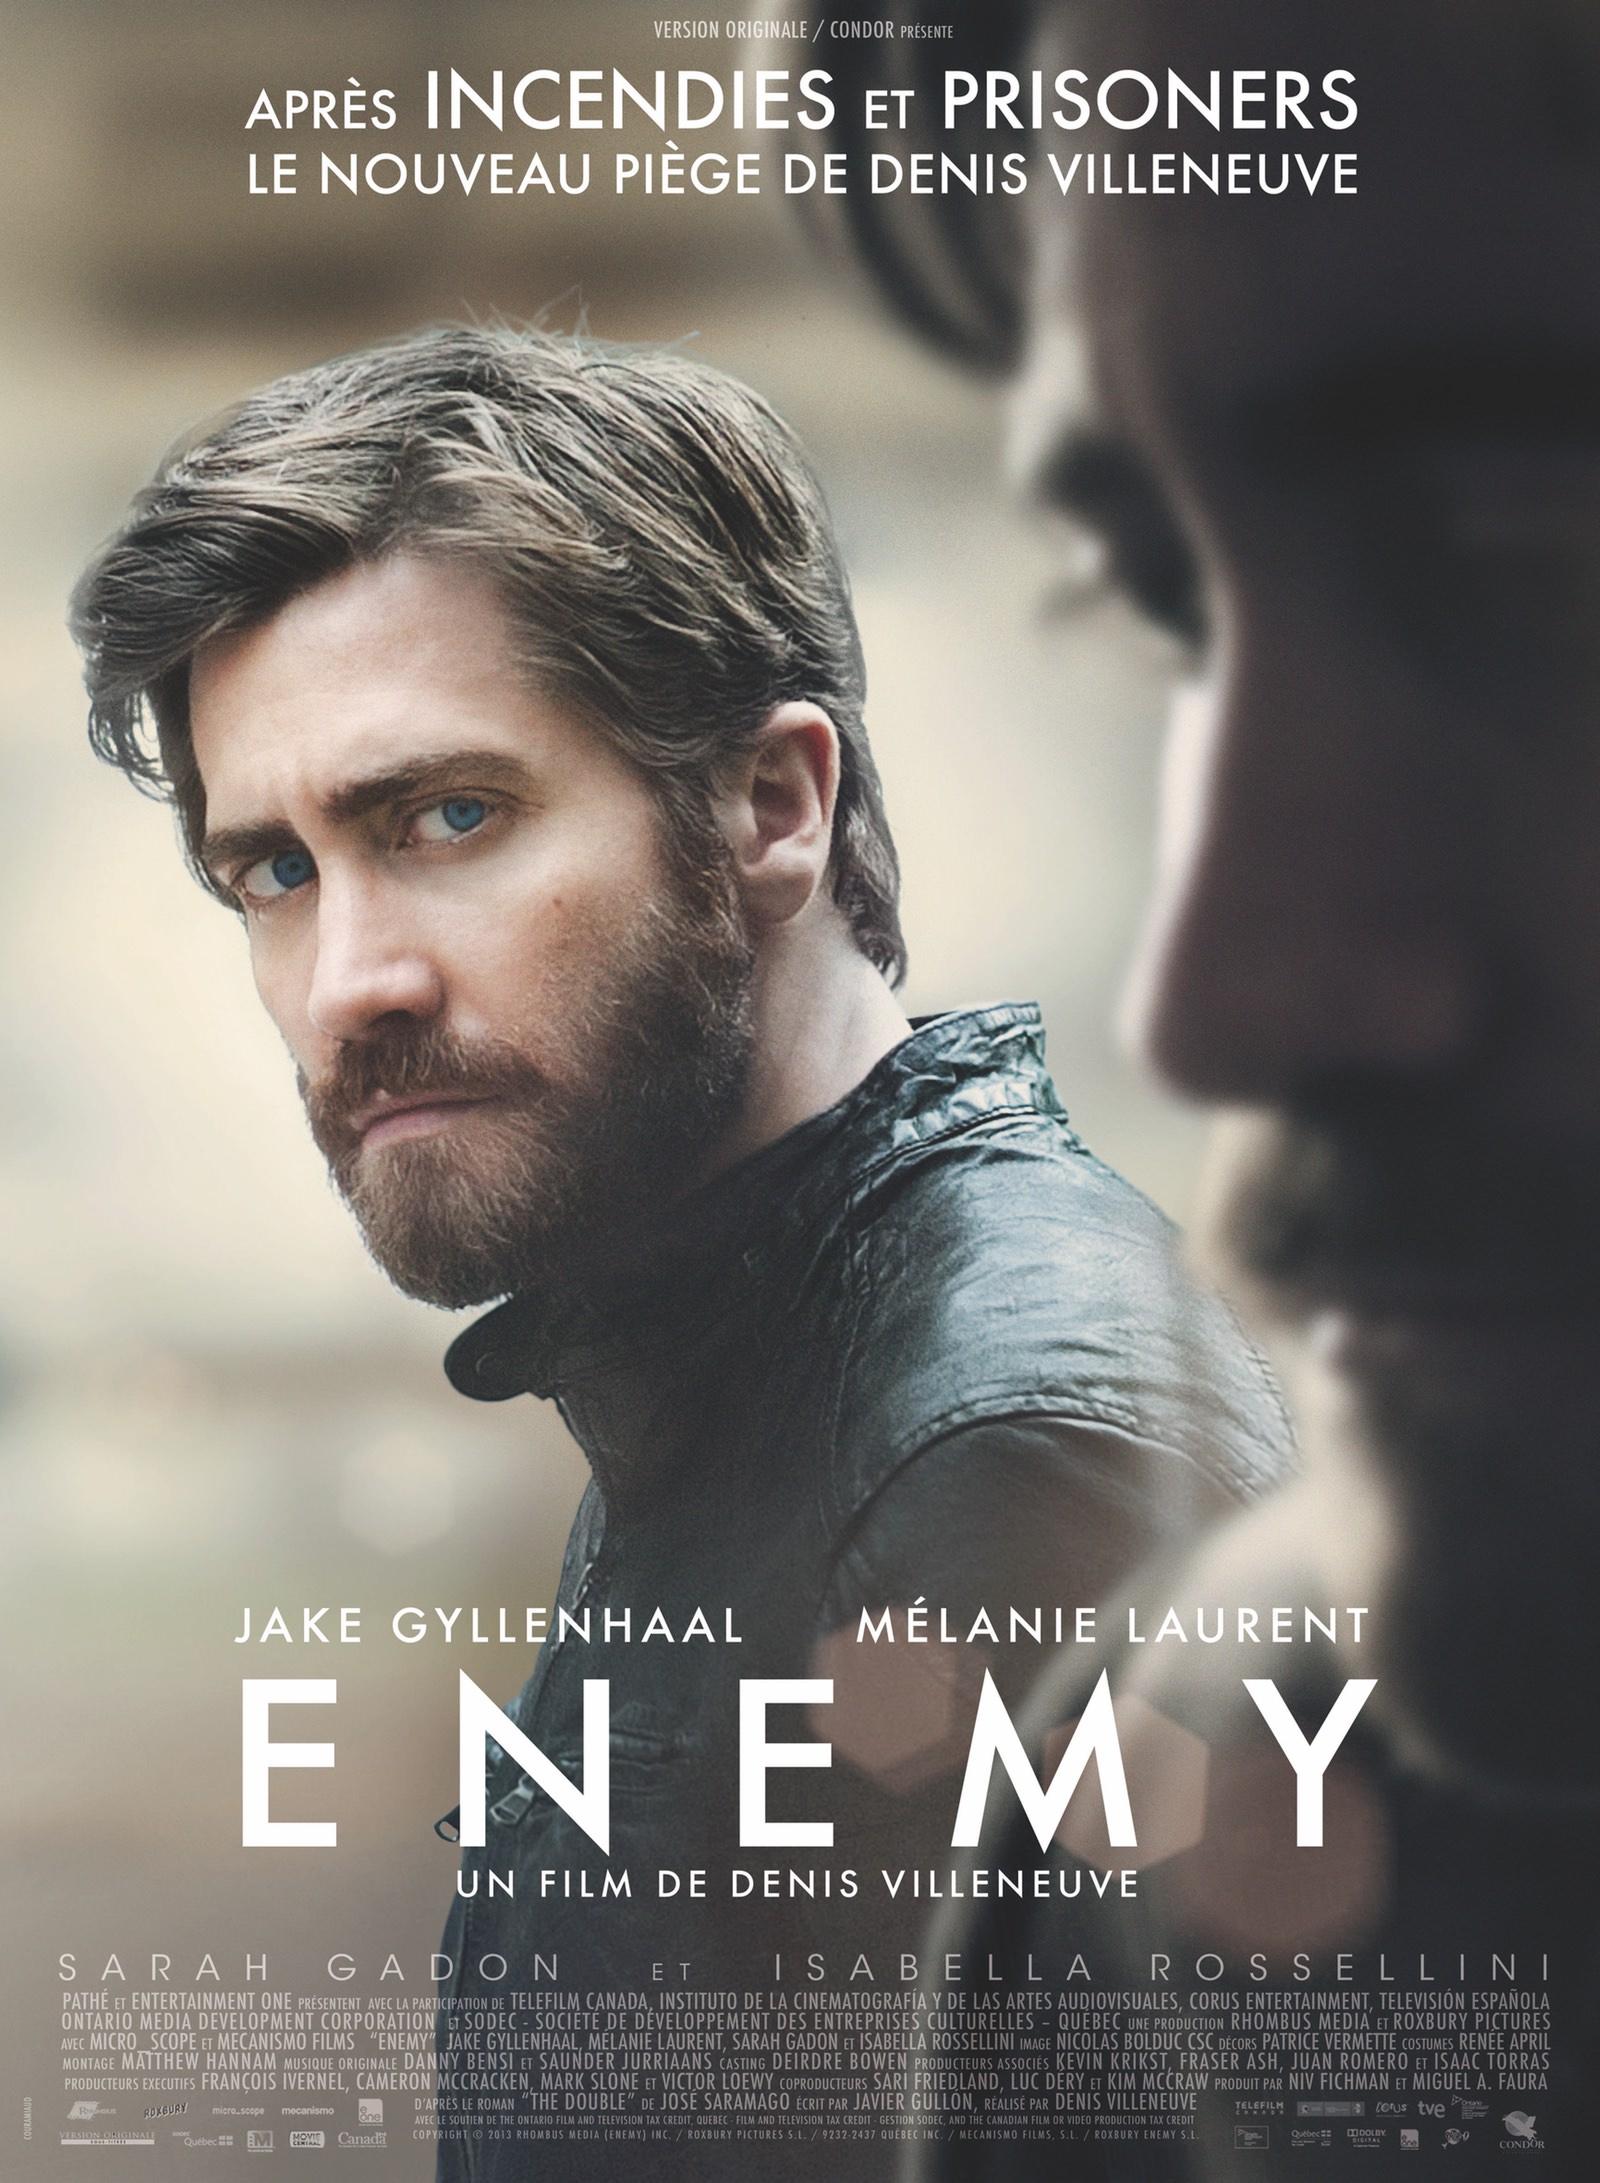 Enemy villeneuve